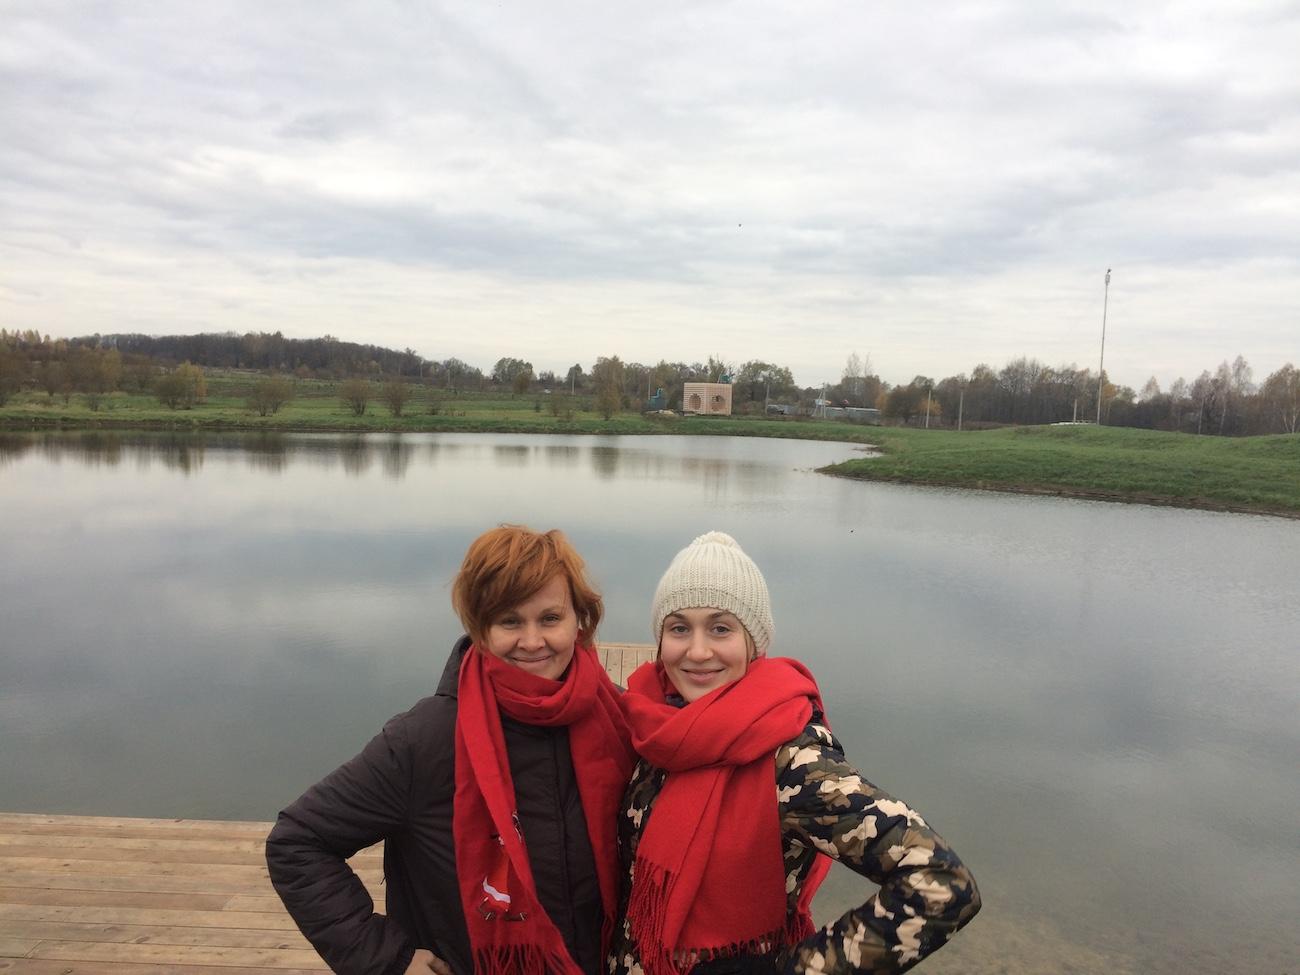 Lusia Karkle and Alena Loktionova, 22 October 2016